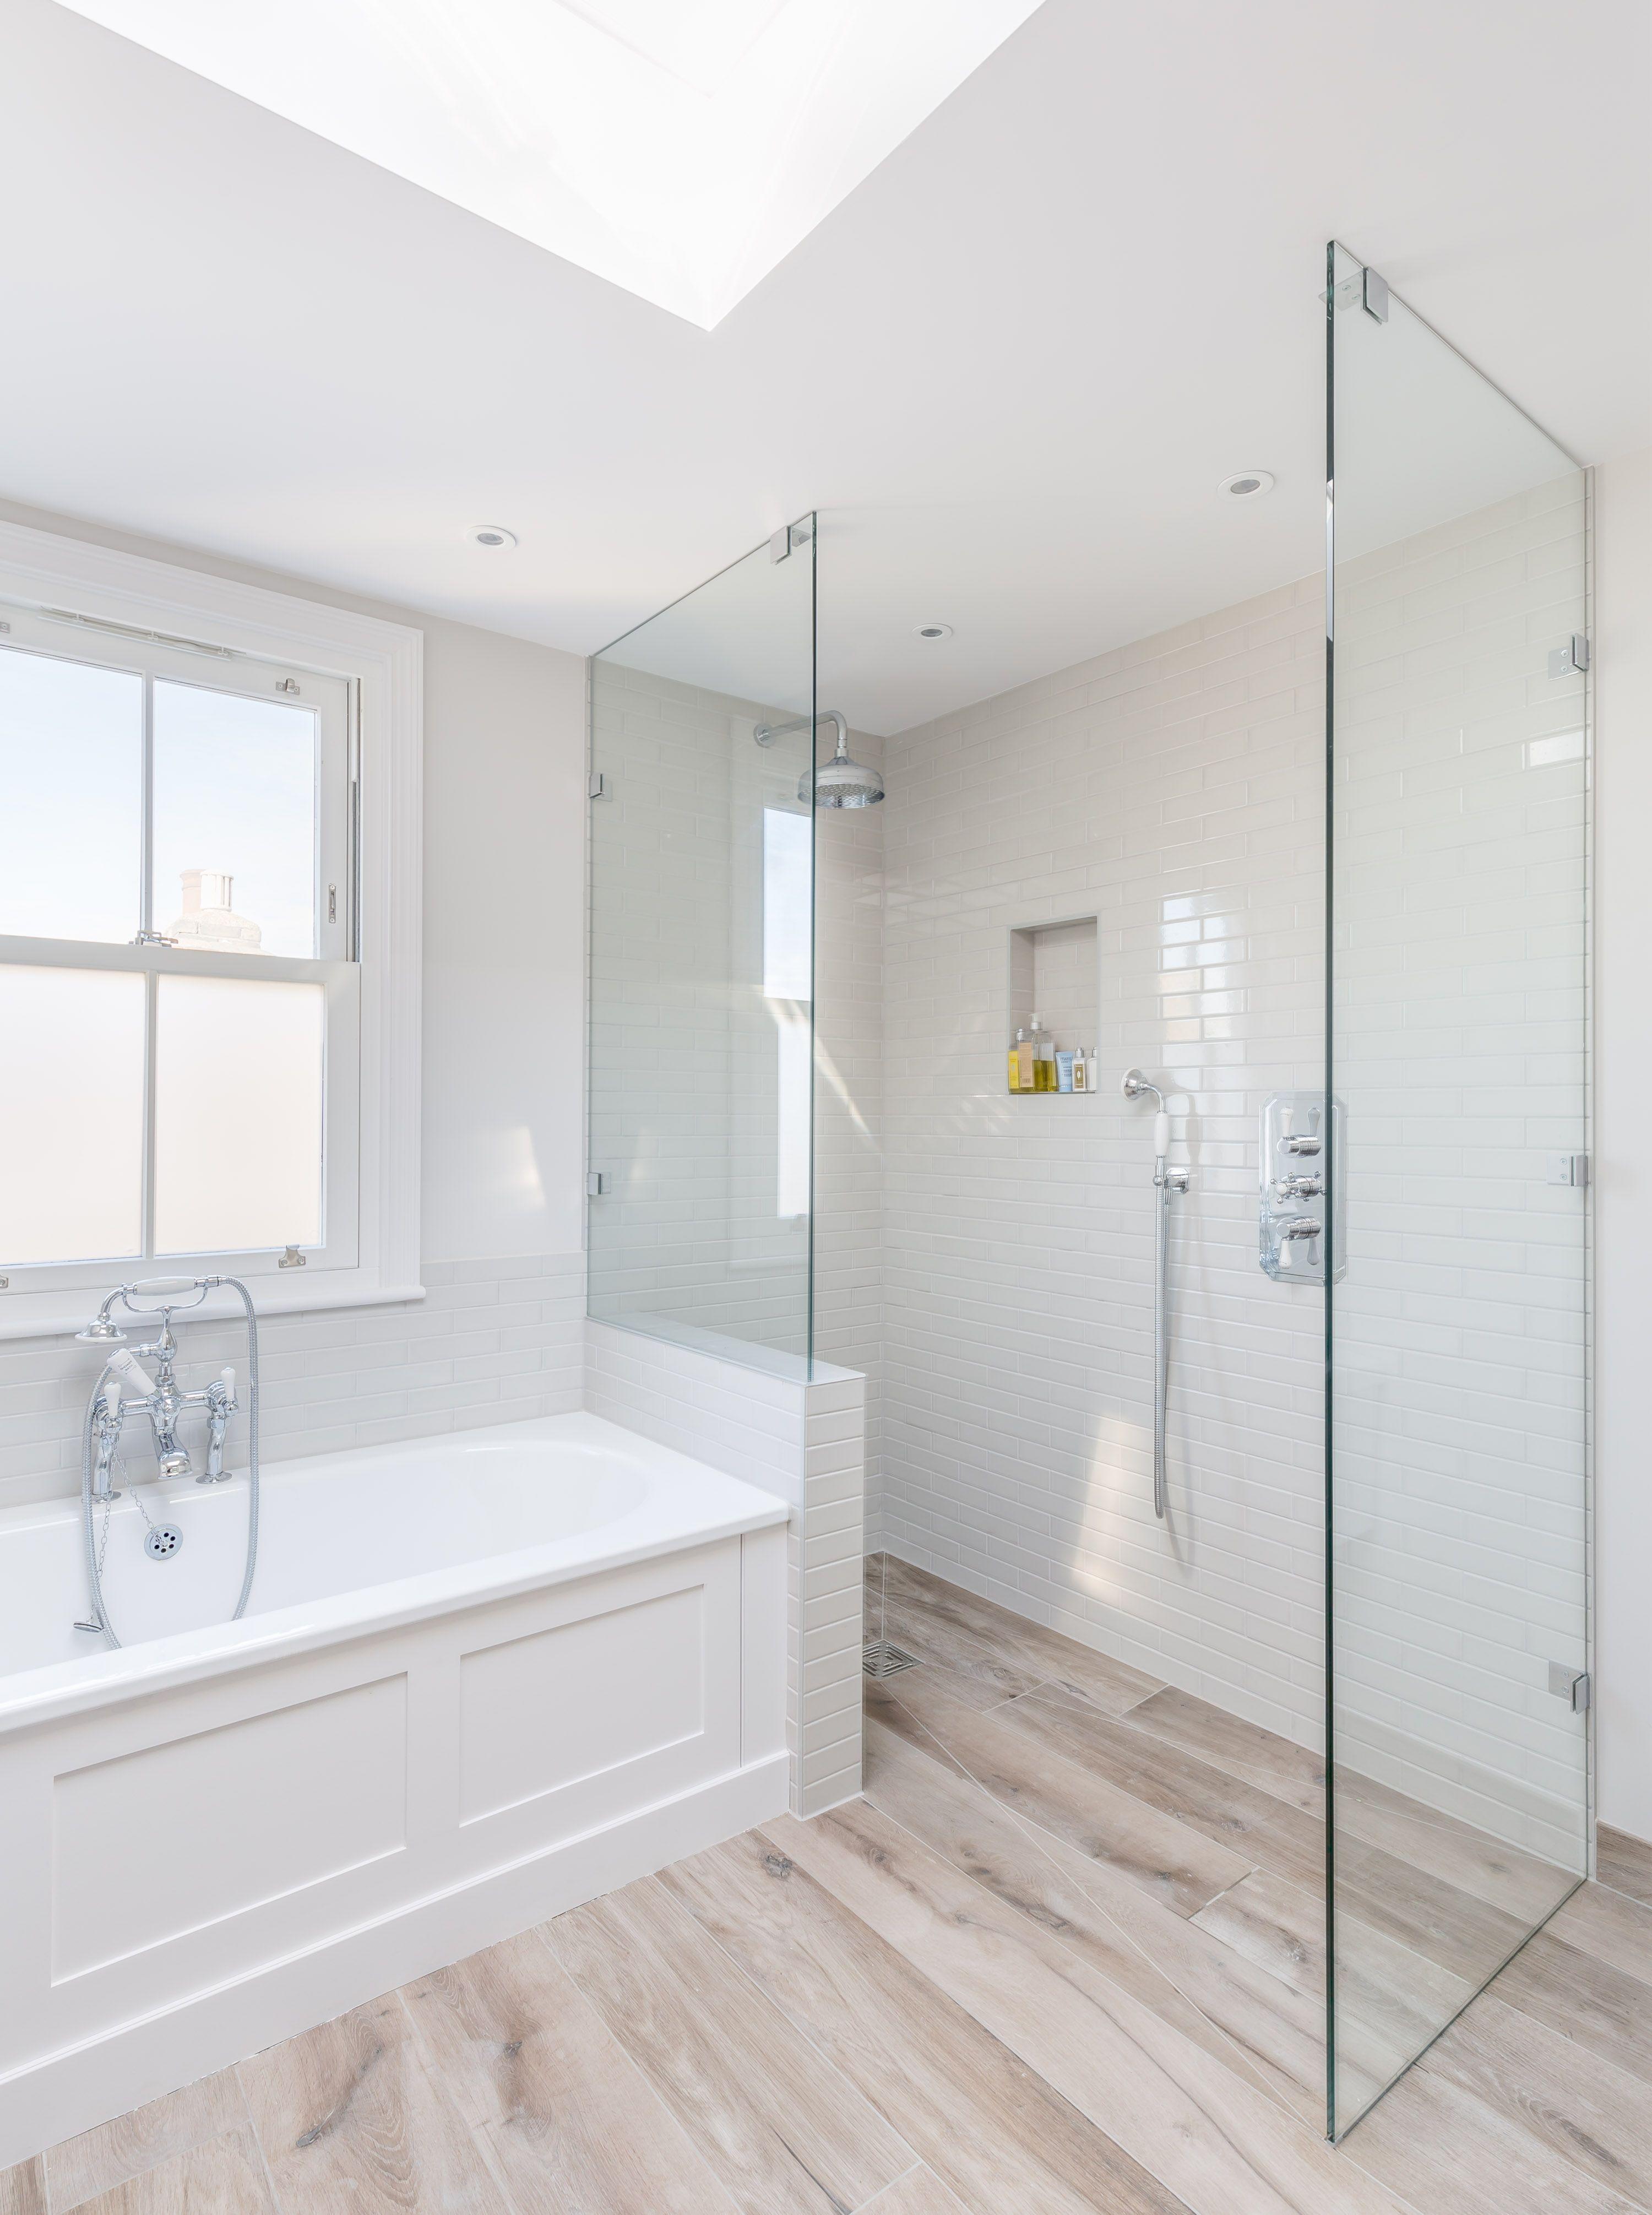 Victorian Property Renovation Walk In Shower Glass Screen Rooflight Wood Effect Tile Fl Wood Floor Bathroom Wood Tile Bathroom Floor Wood Tile Bathroom